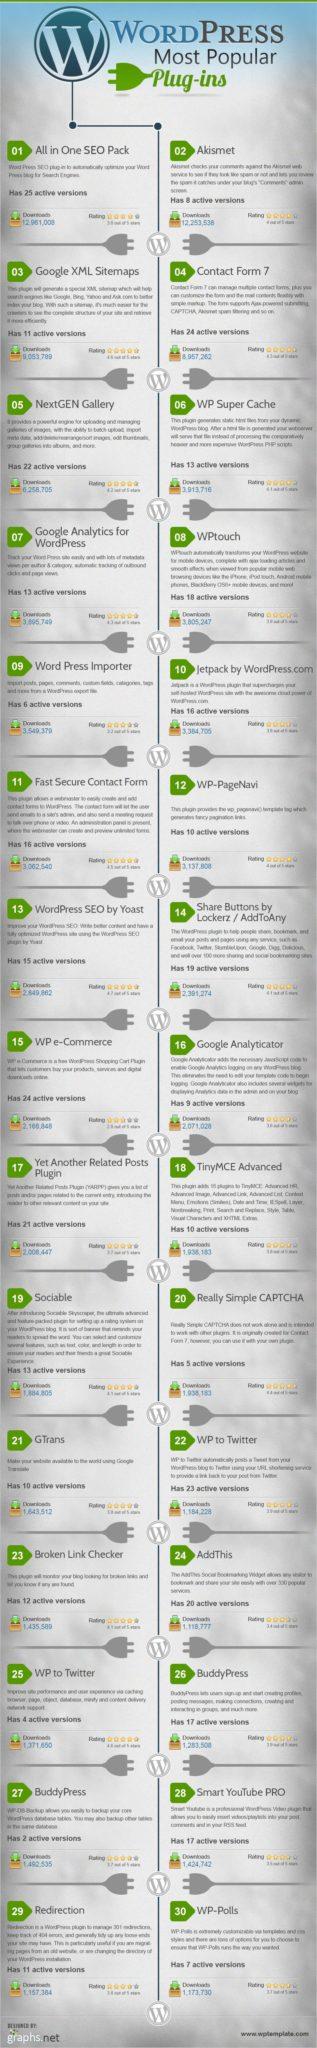 most-popular-plugins-for-wordpress-info